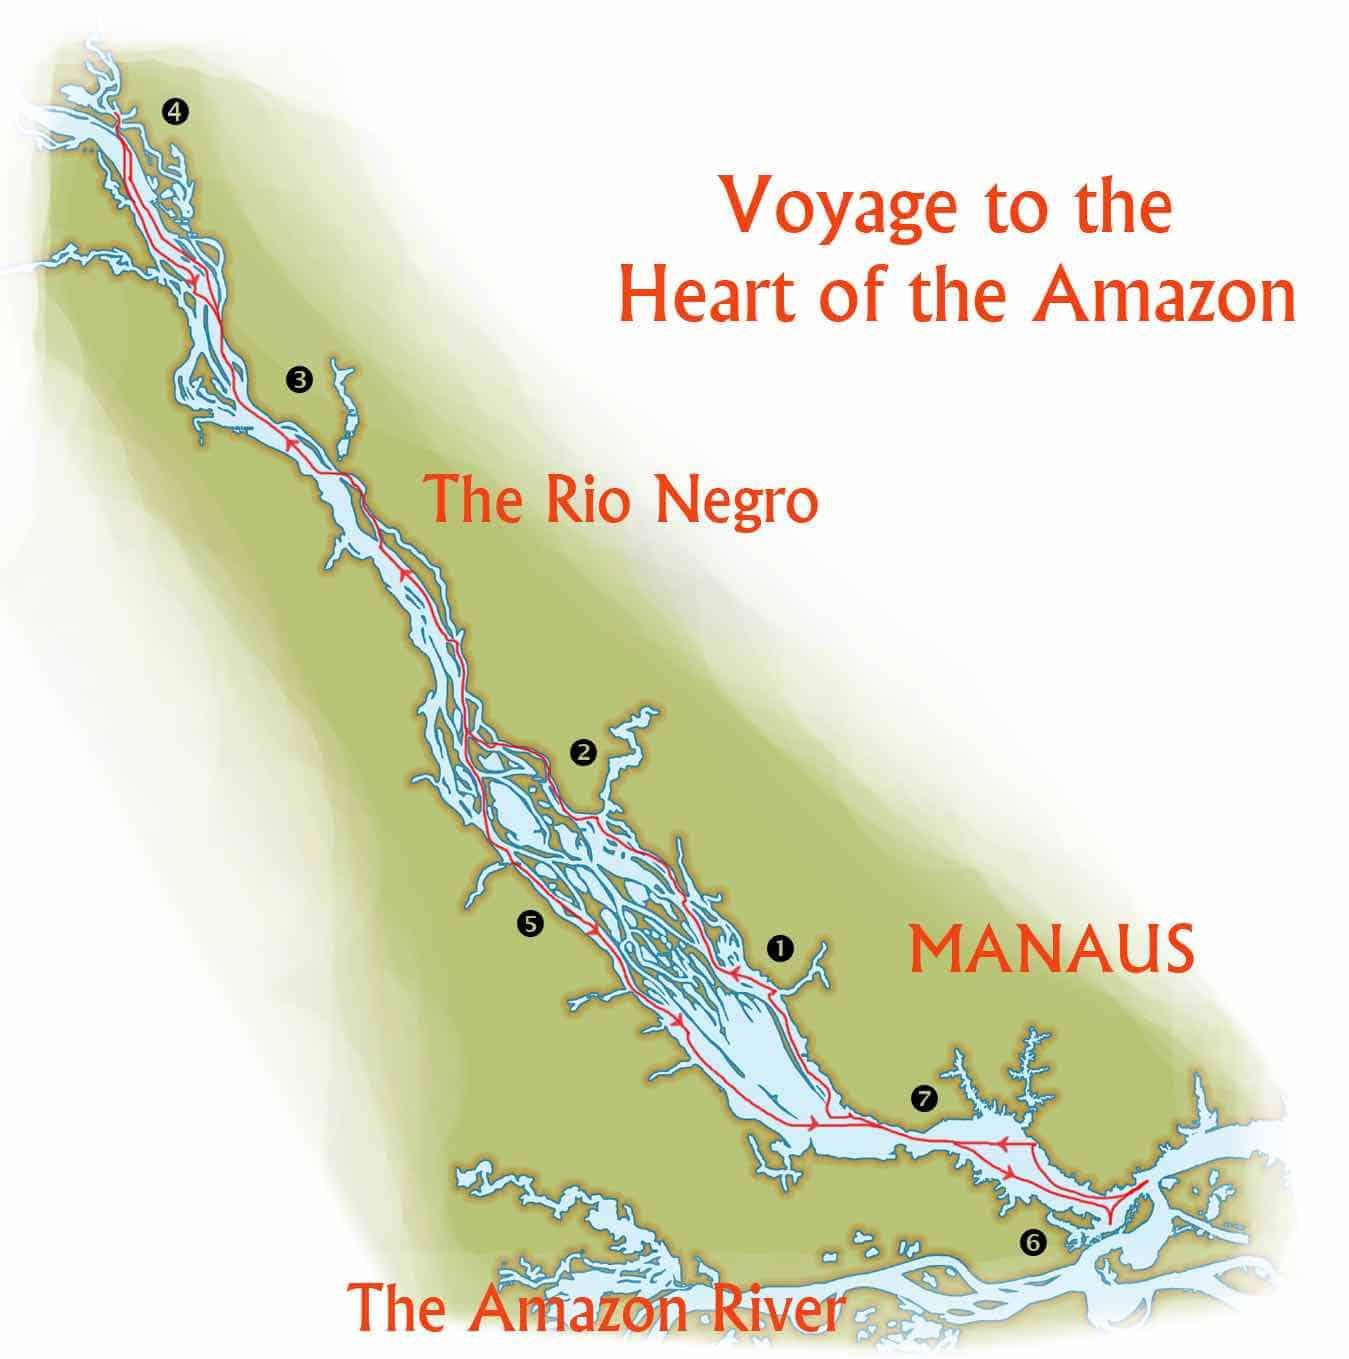 Rutekort over rejse på Rio Negro langs Amazonfloden